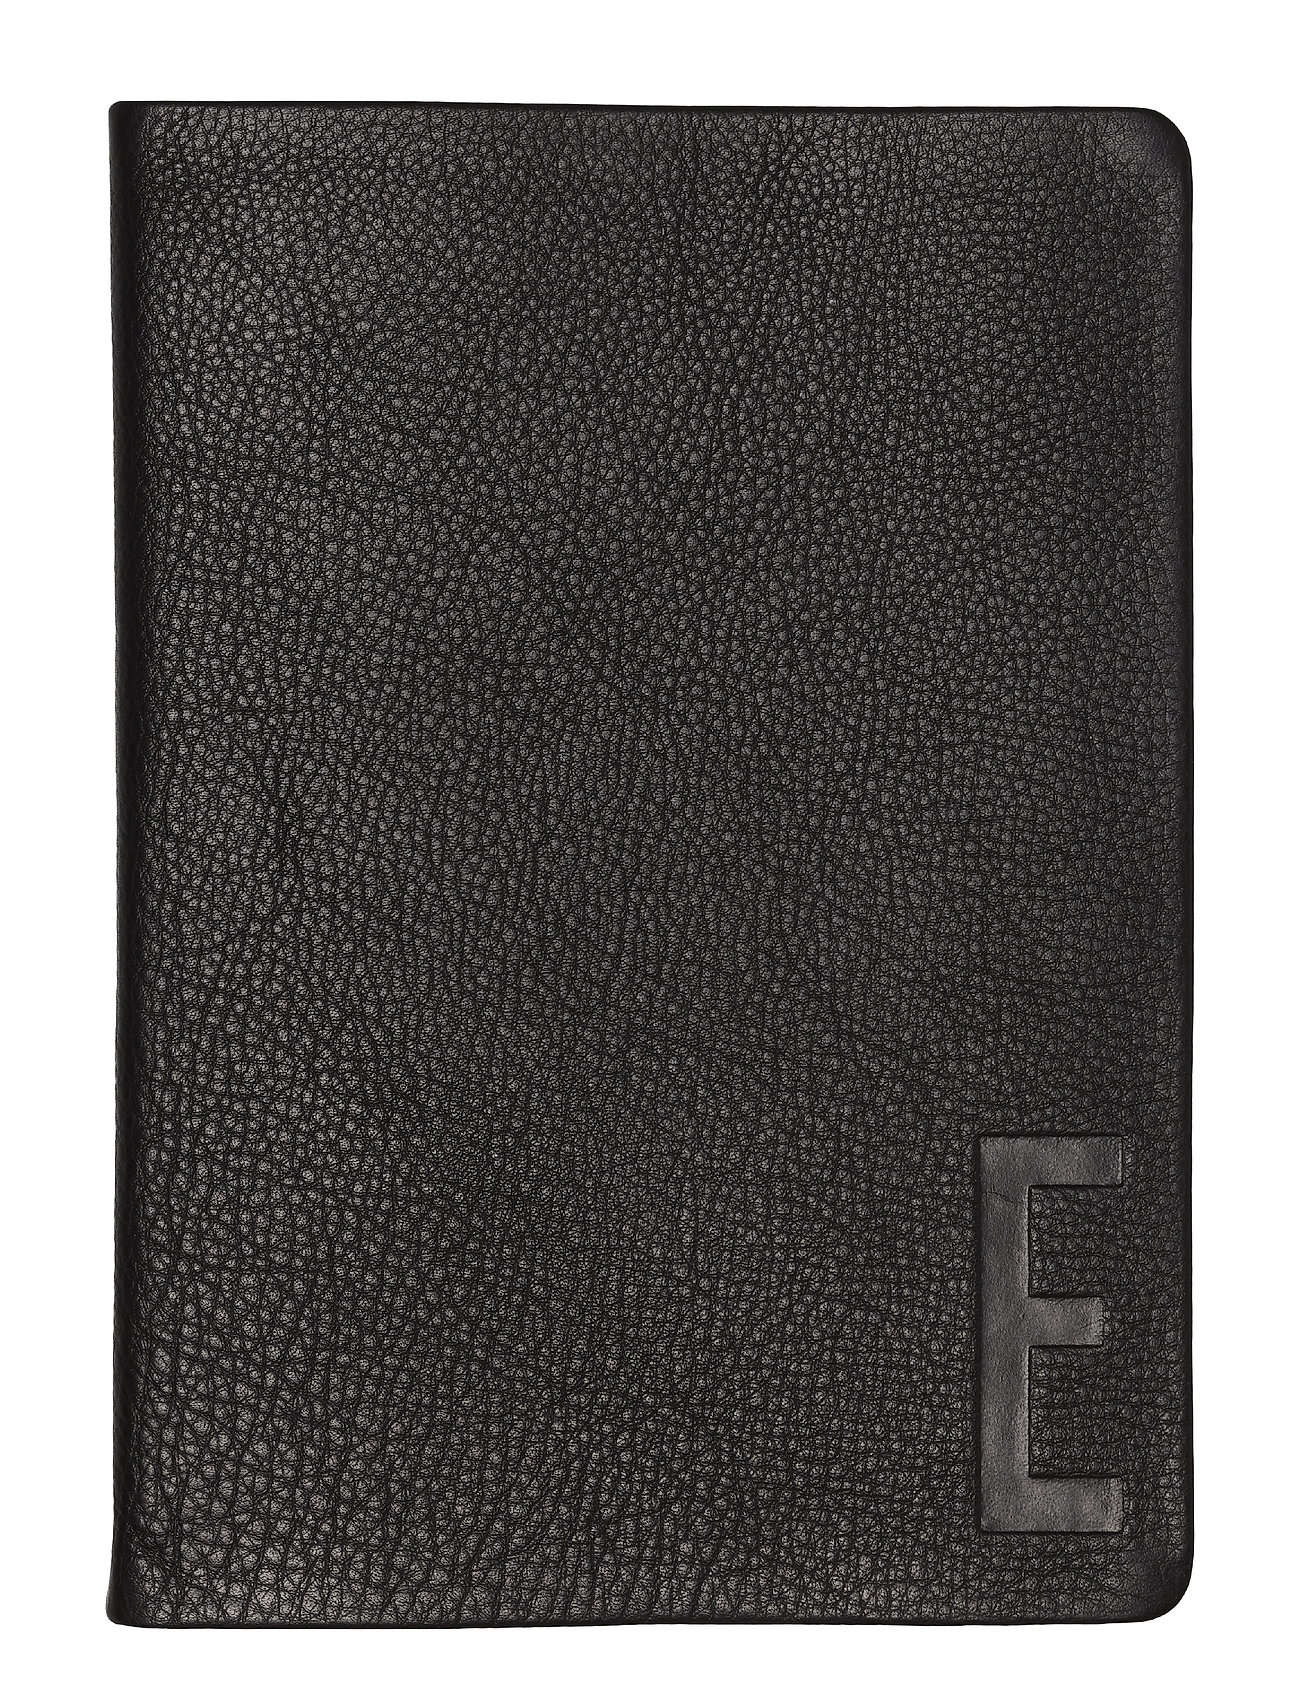 Suit Up - Personal Notebook Kodin Sisustus Musta Design Letters